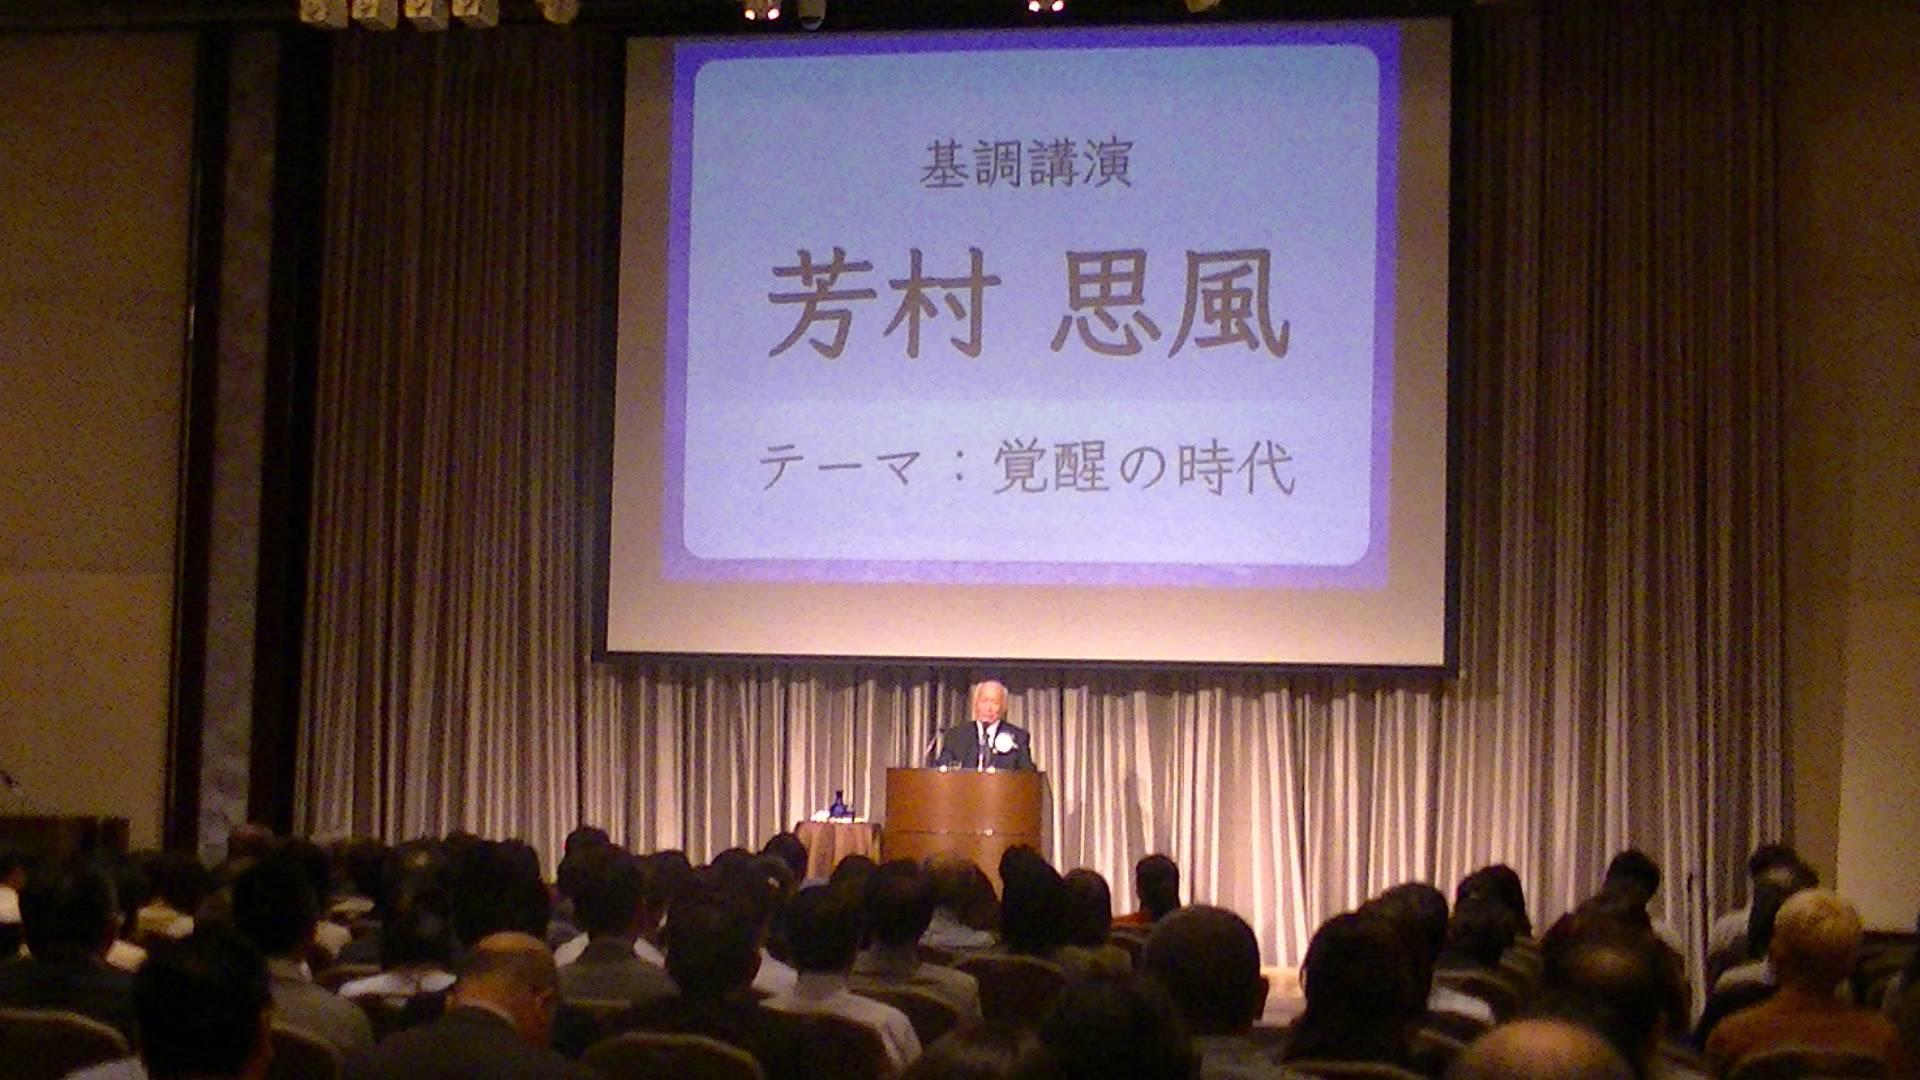 PIC 1709 1 - 思風会全国大会in広島